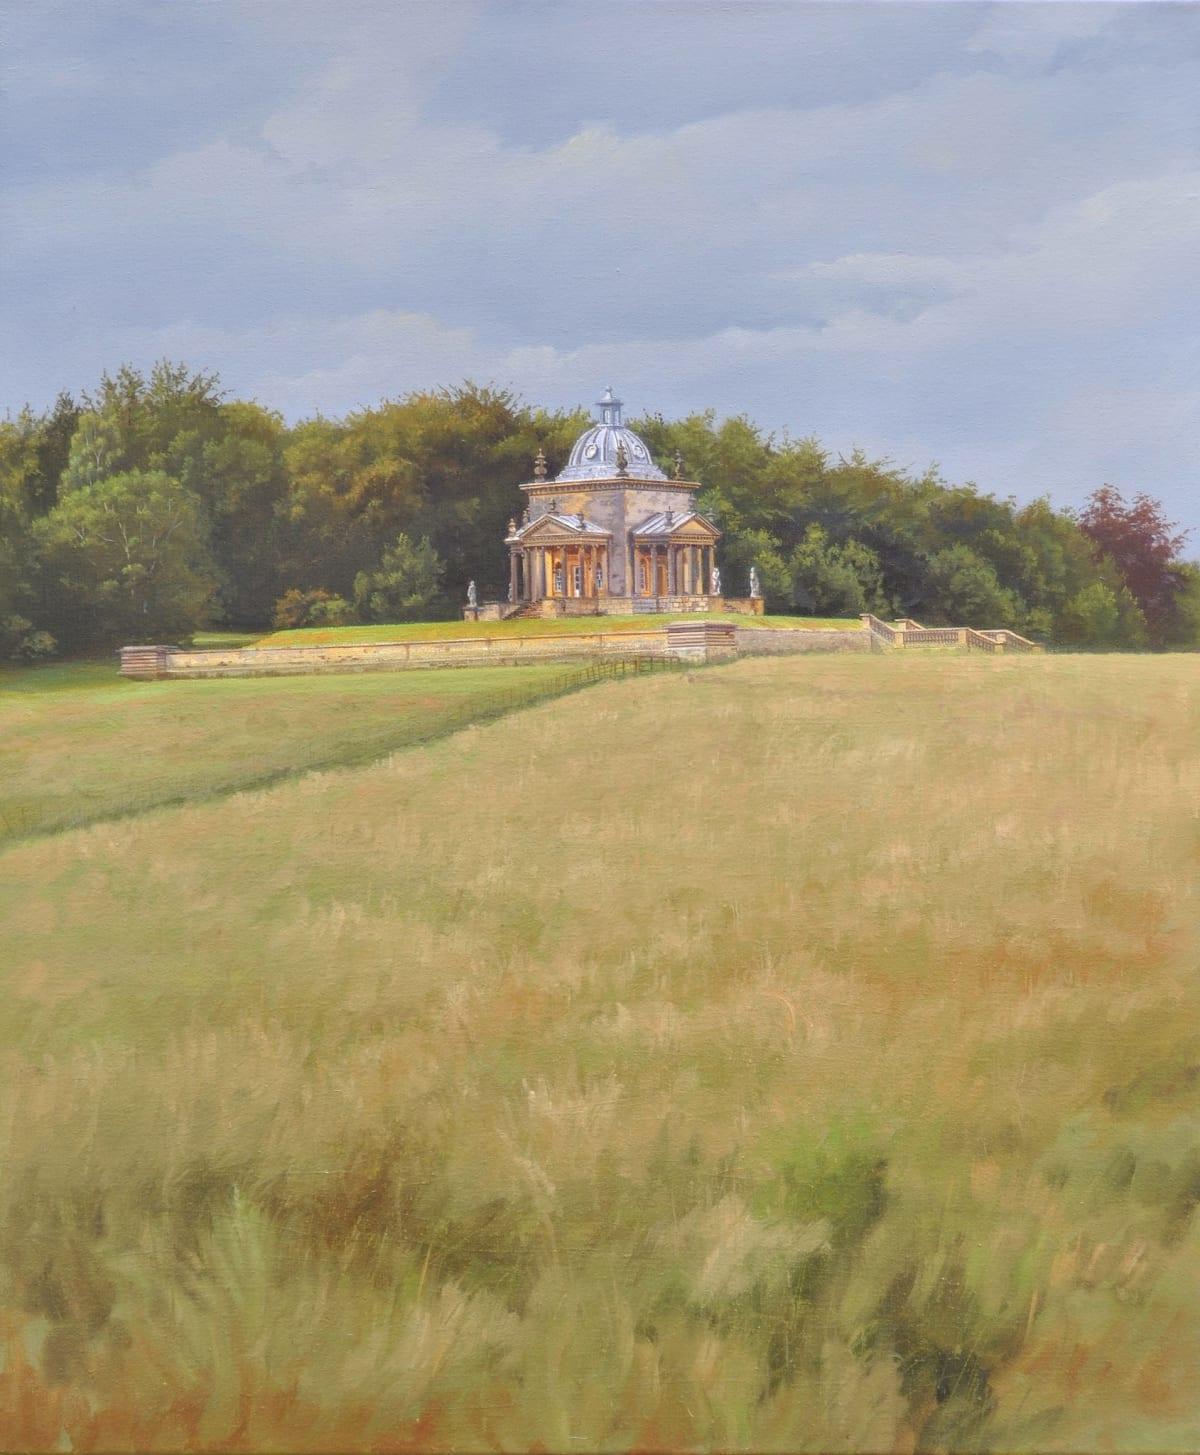 Carl Laubin T4W Oil on canvas 60 x 50 cm